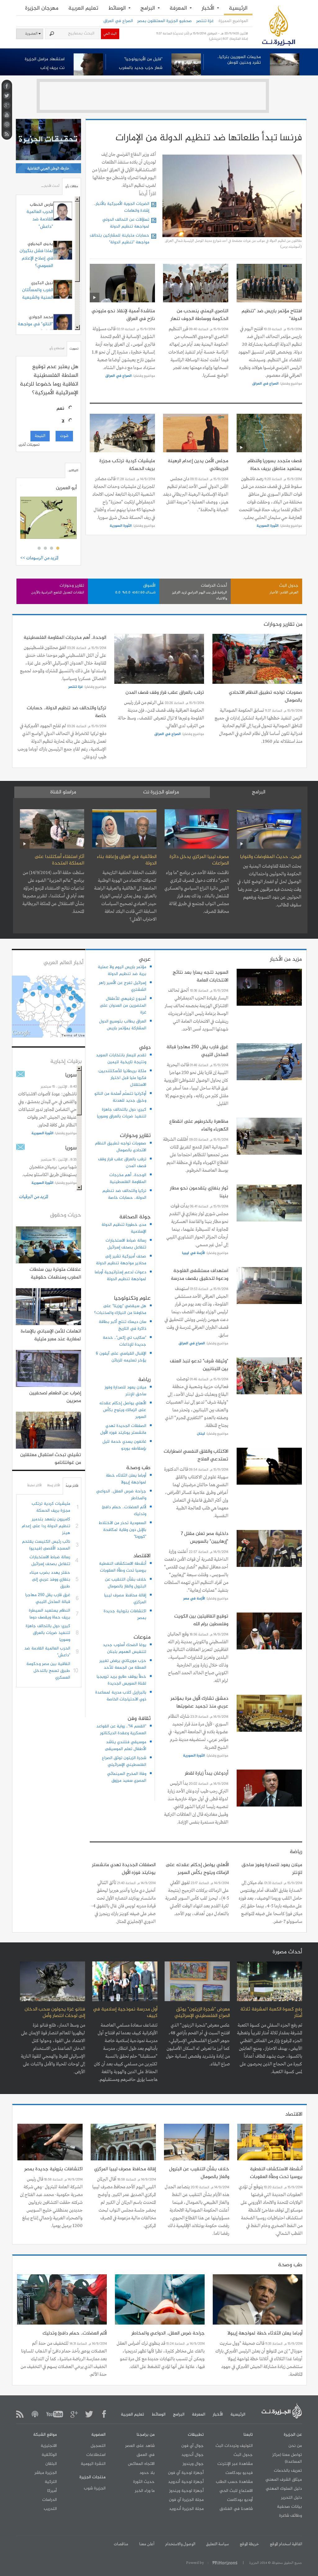 Al Jazeera at Monday Sept. 15, 2014, 9:09 a.m. UTC